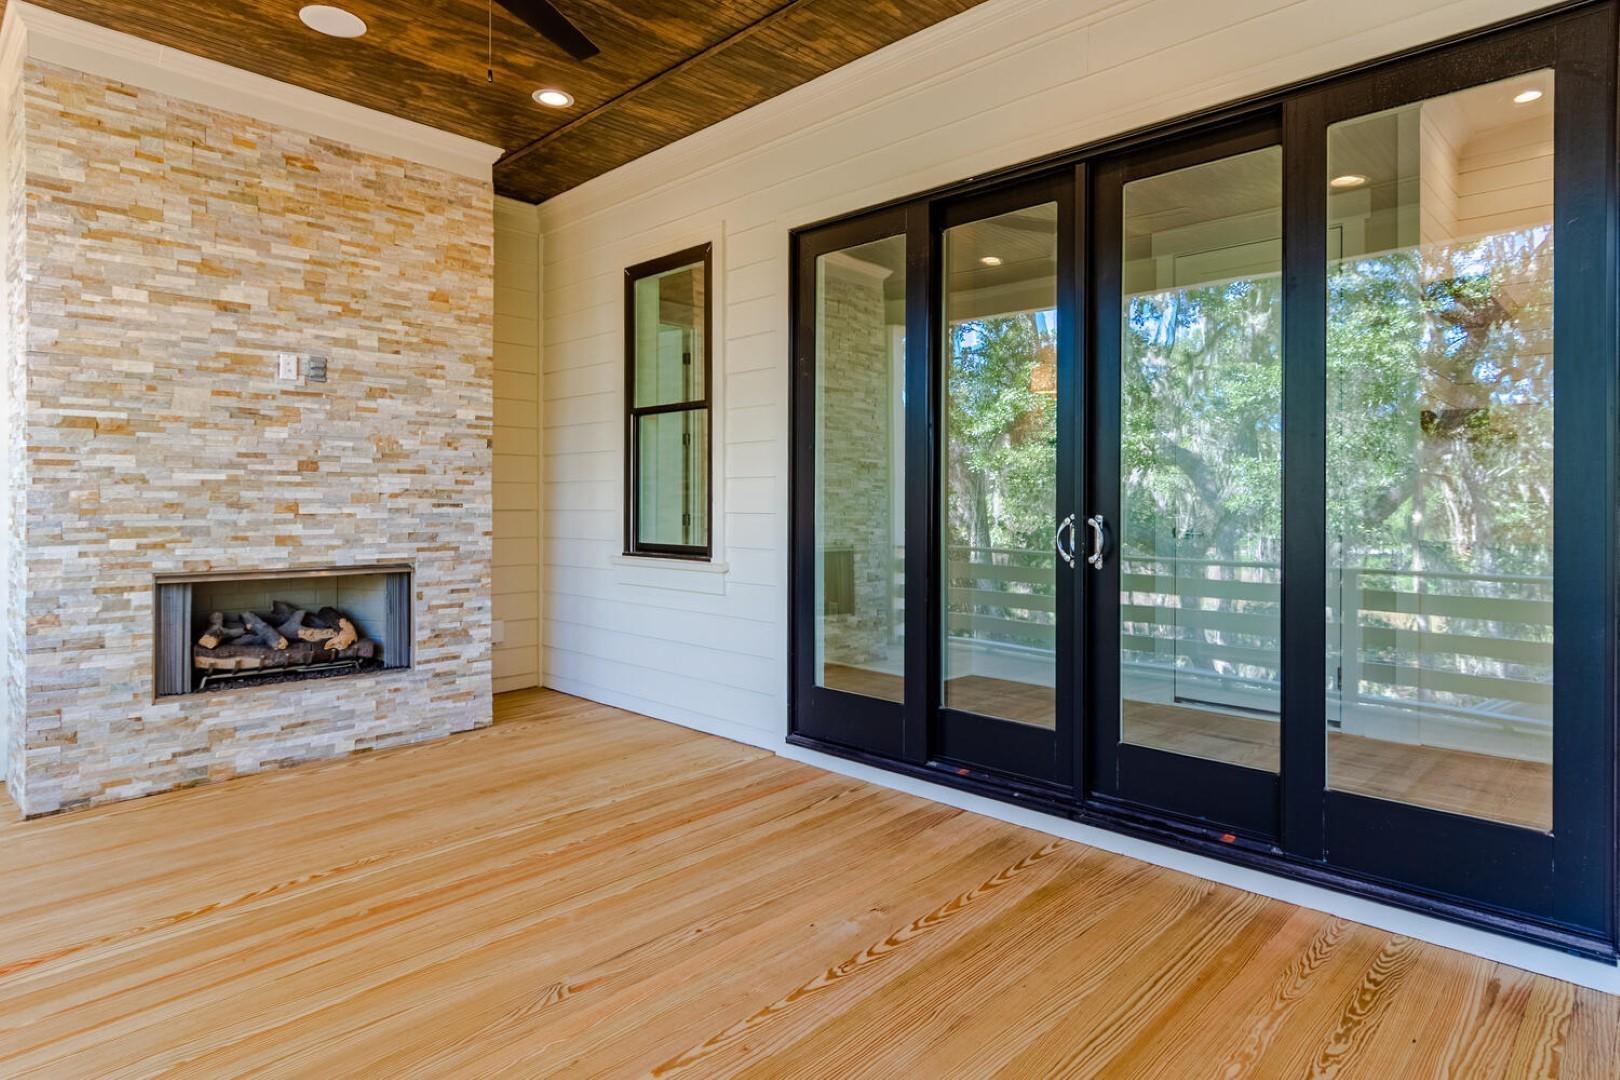 Scanlonville Homes For Sale - 156 5th, Mount Pleasant, SC - 8